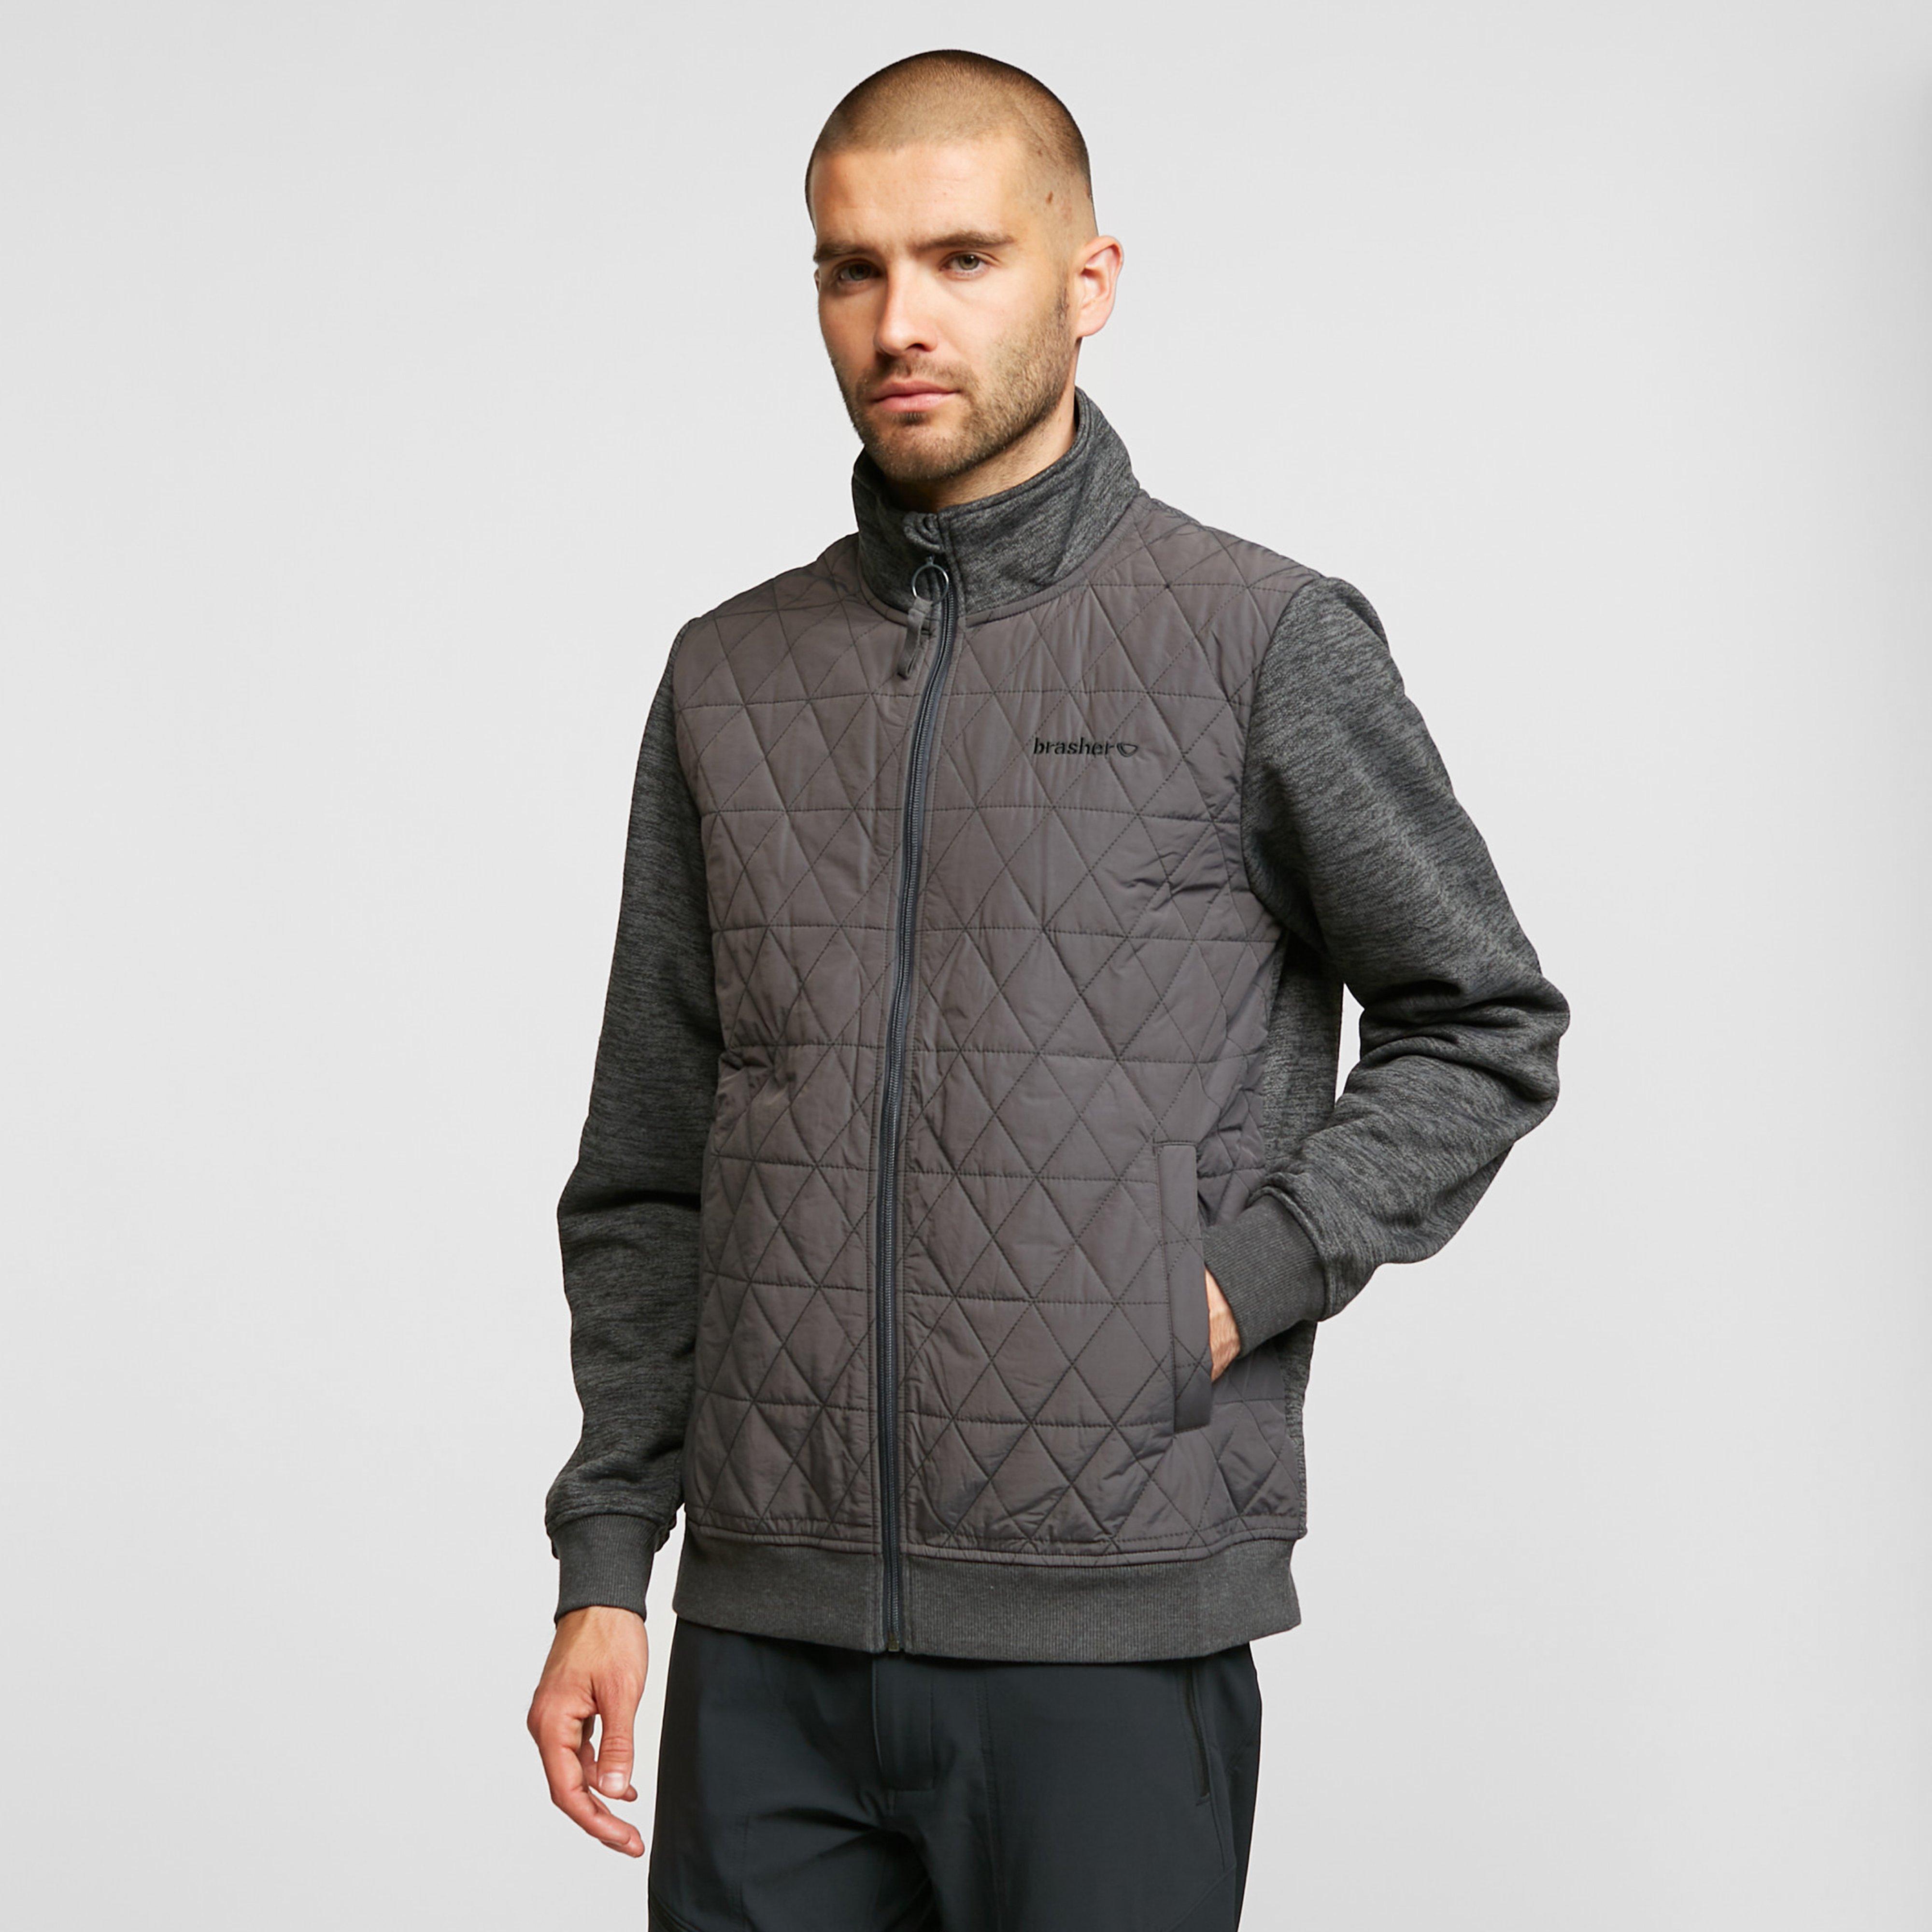 Brasher Mens Branstree Jacket - Grey/dgy  Grey/dgy